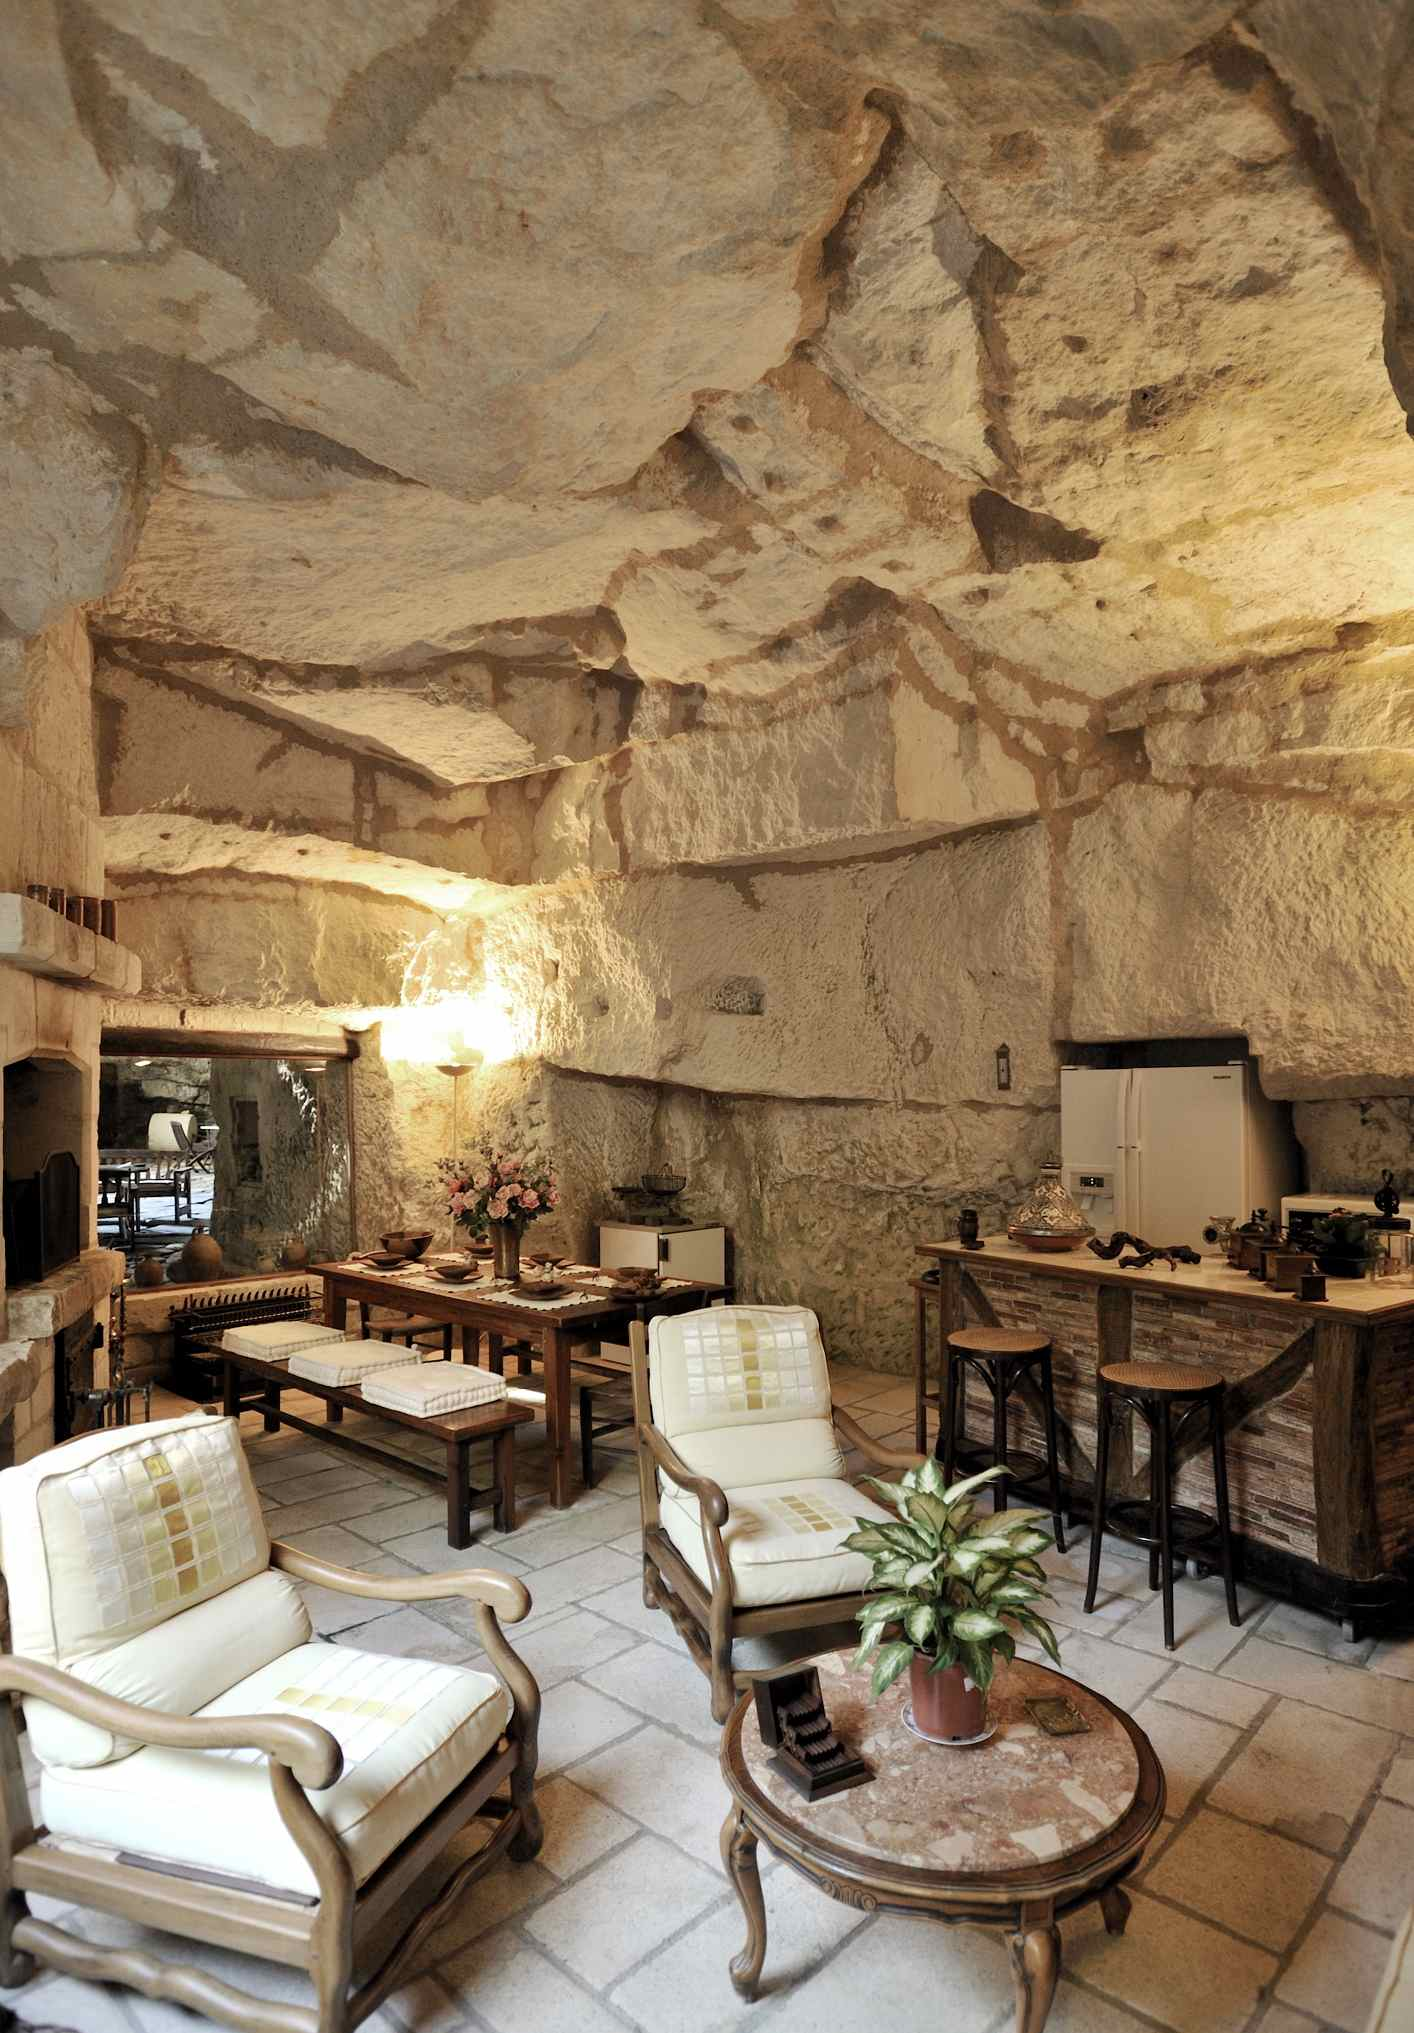 Maison troglodyte on pinterest underground homes caves for Decoration maison occasion